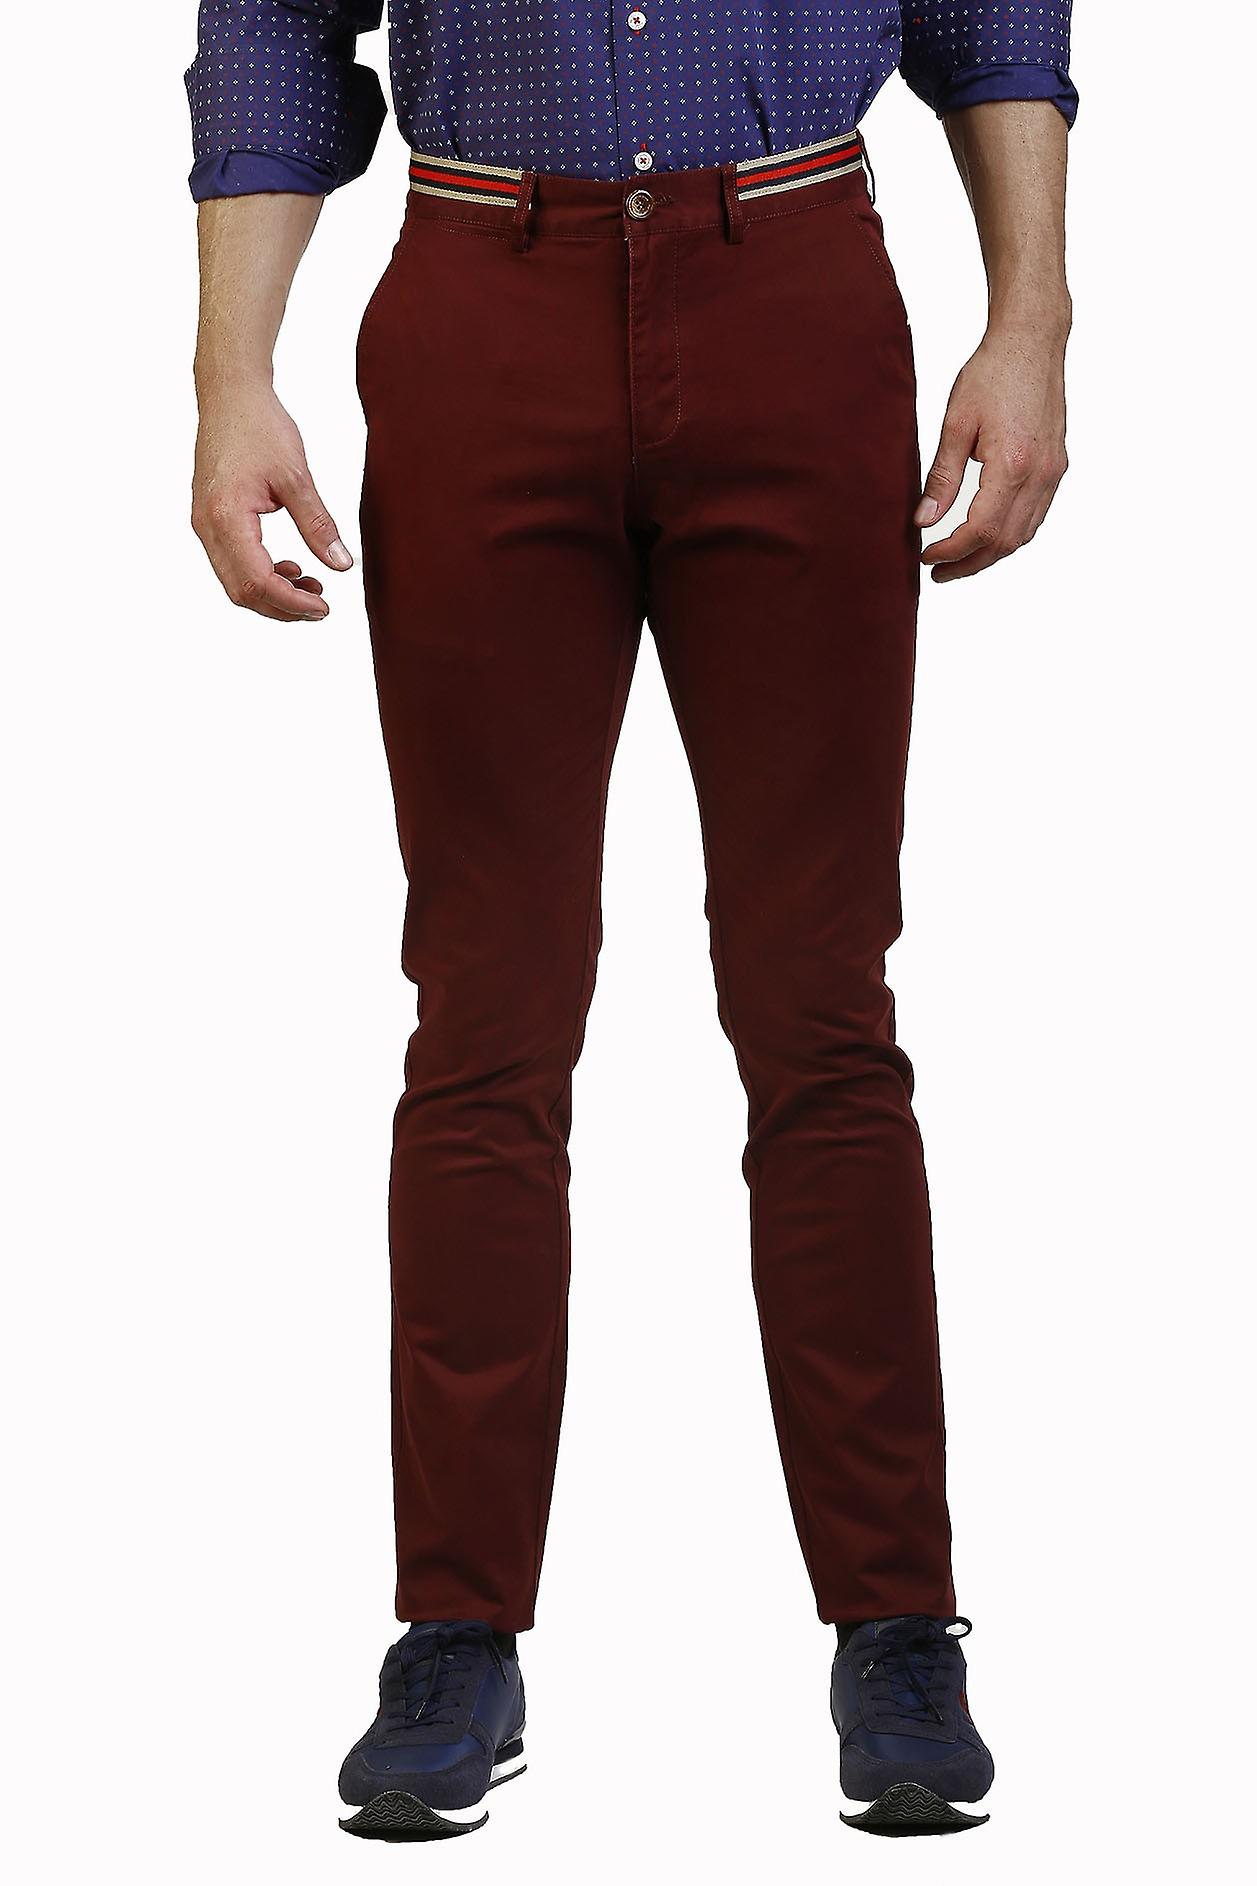 Pantalon Hombre The Time Of Bocha JI1PPOLO-118-Burdeos 713